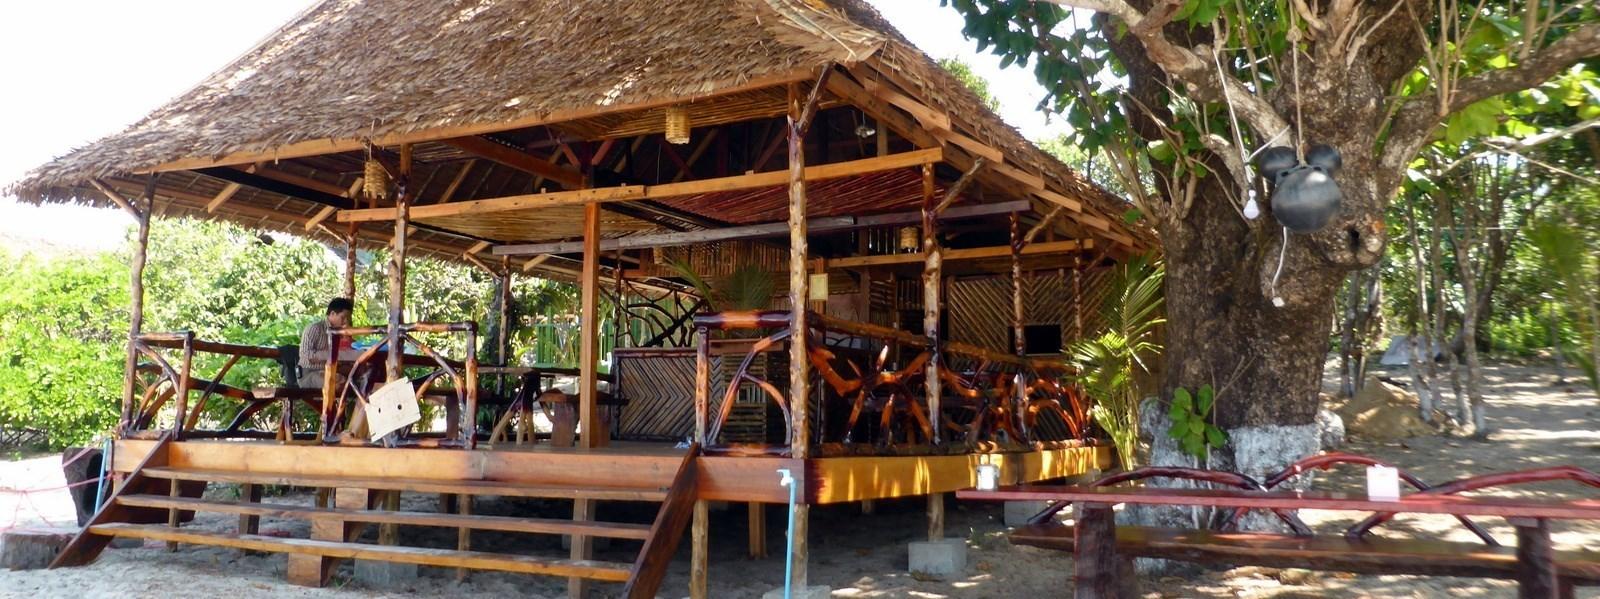 sinhtauk-restaurant-beach-Kopie-1